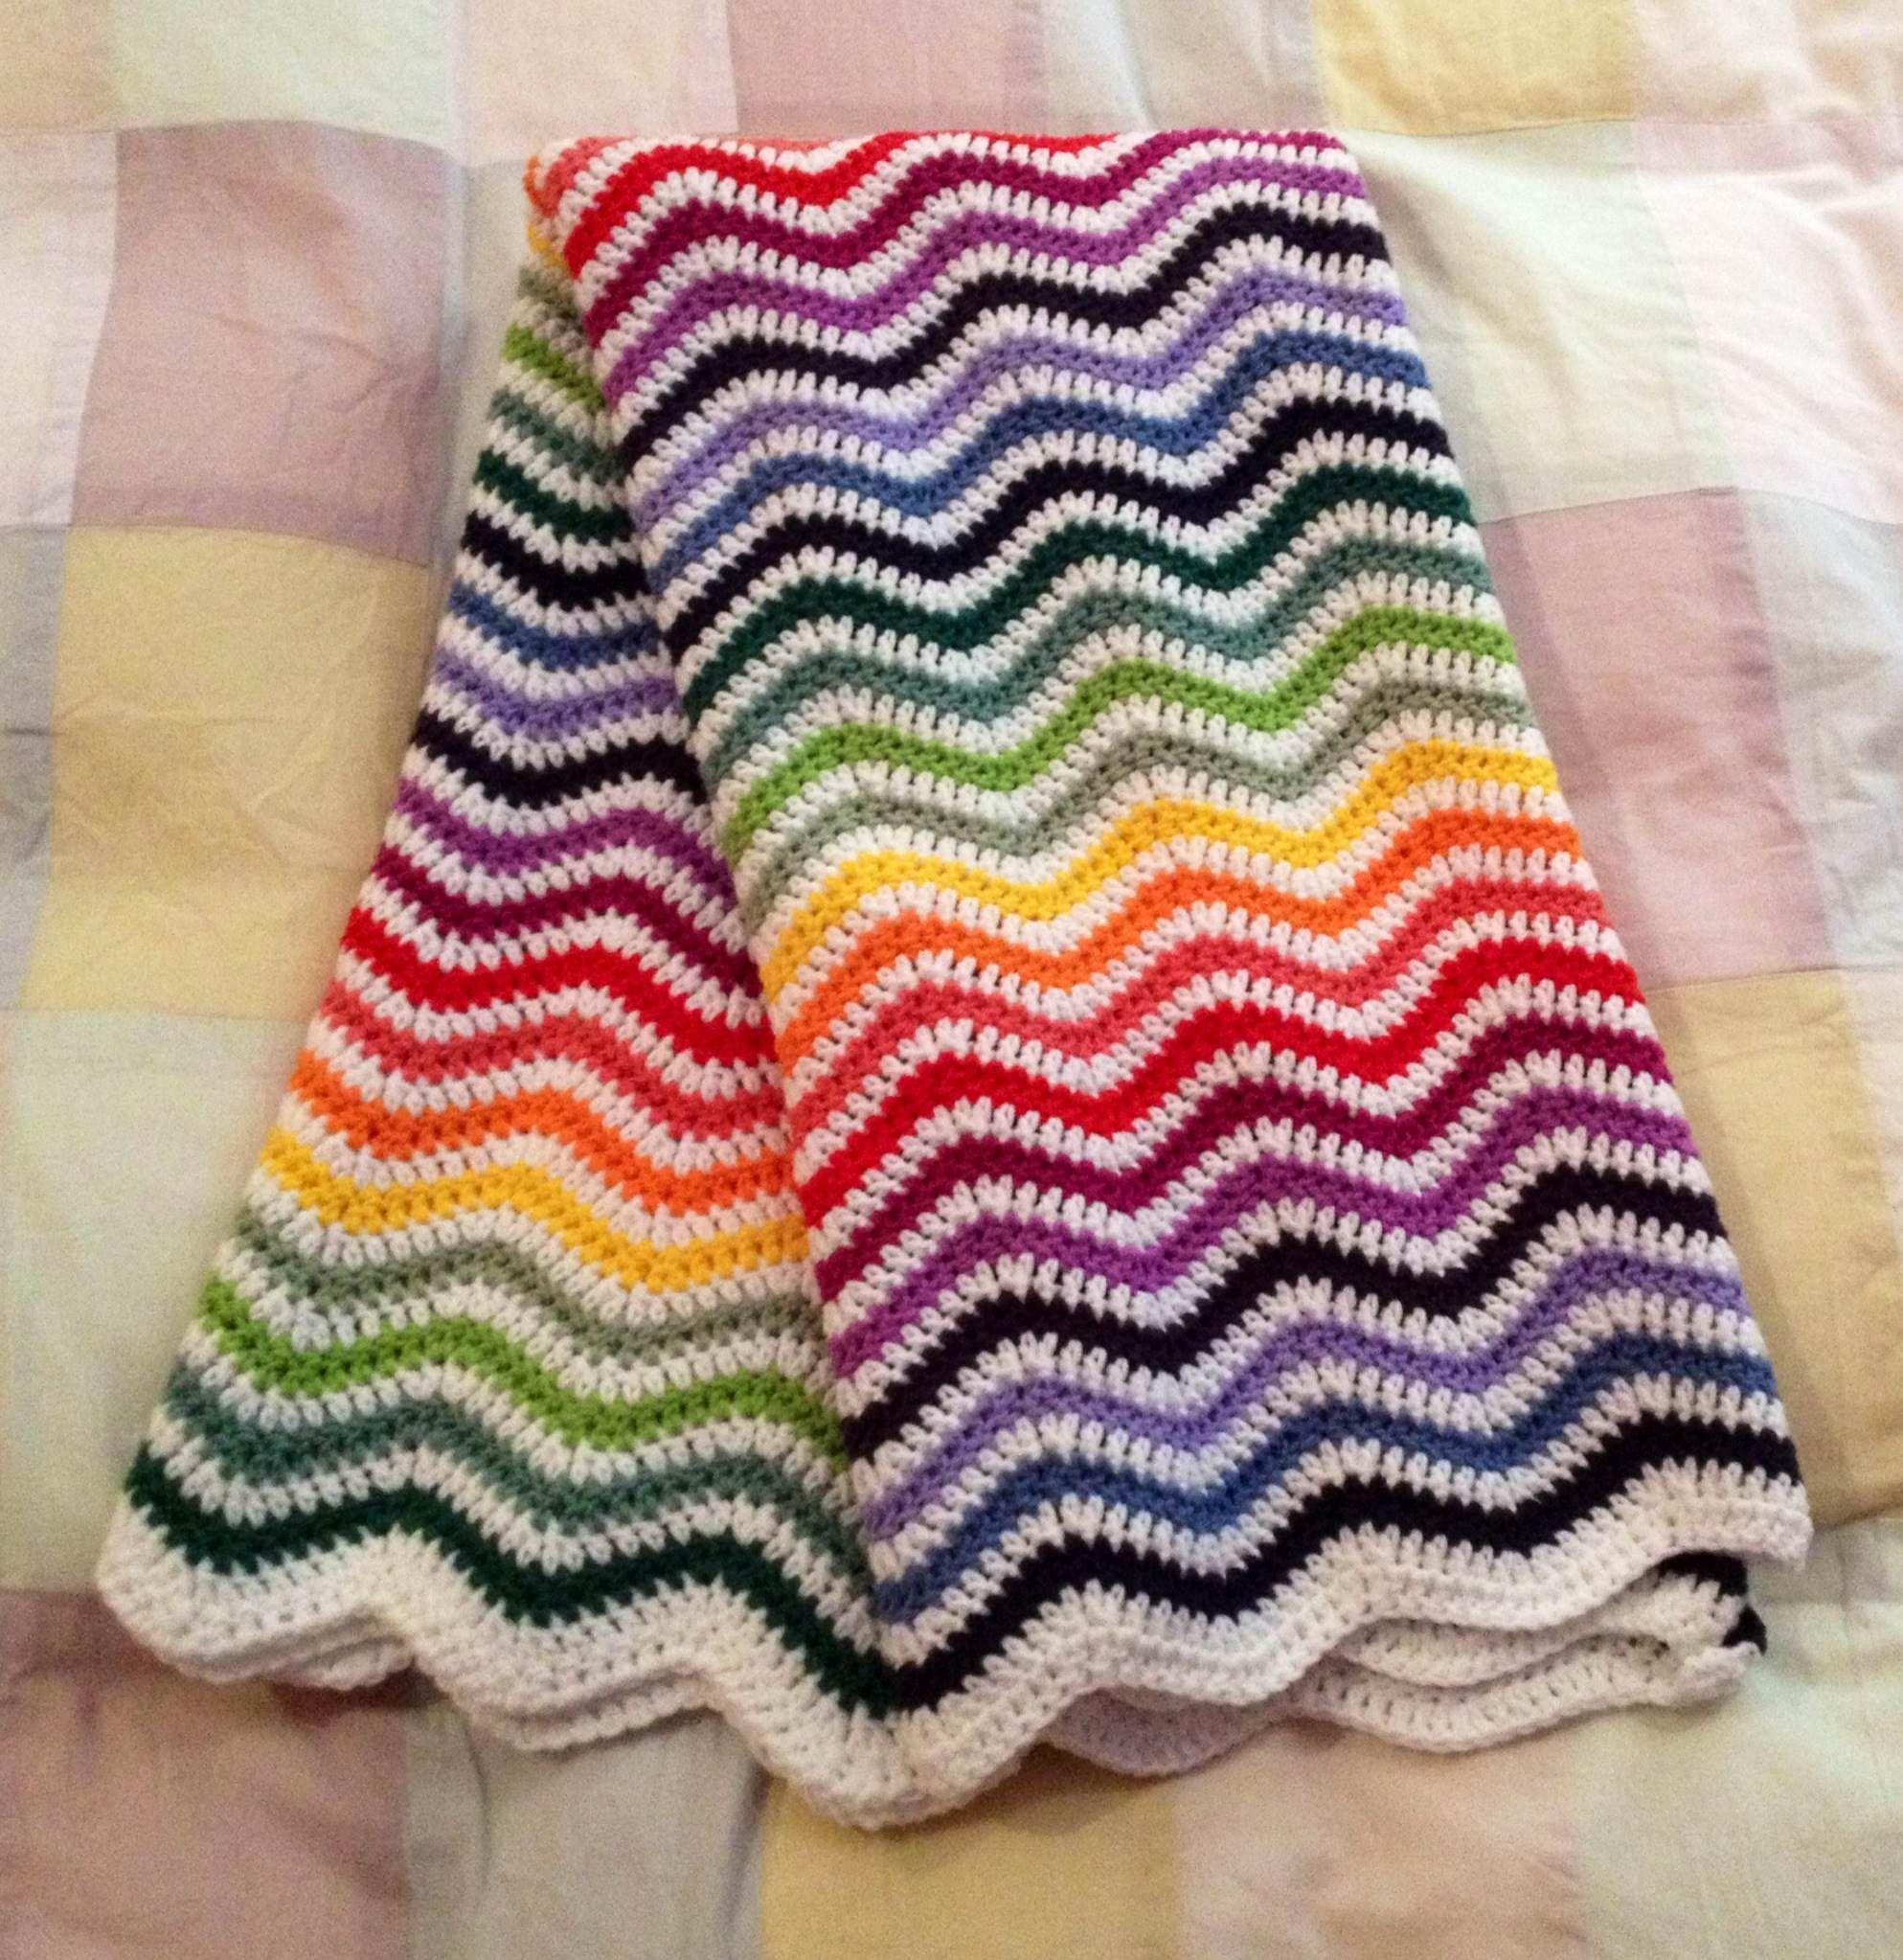 Colourful Crochet Ripple Blanket Using The Pattern By Lucy Attic24 Crochet Ripple Blanket Crochet Blanket Rainbow Rainbow Crochet